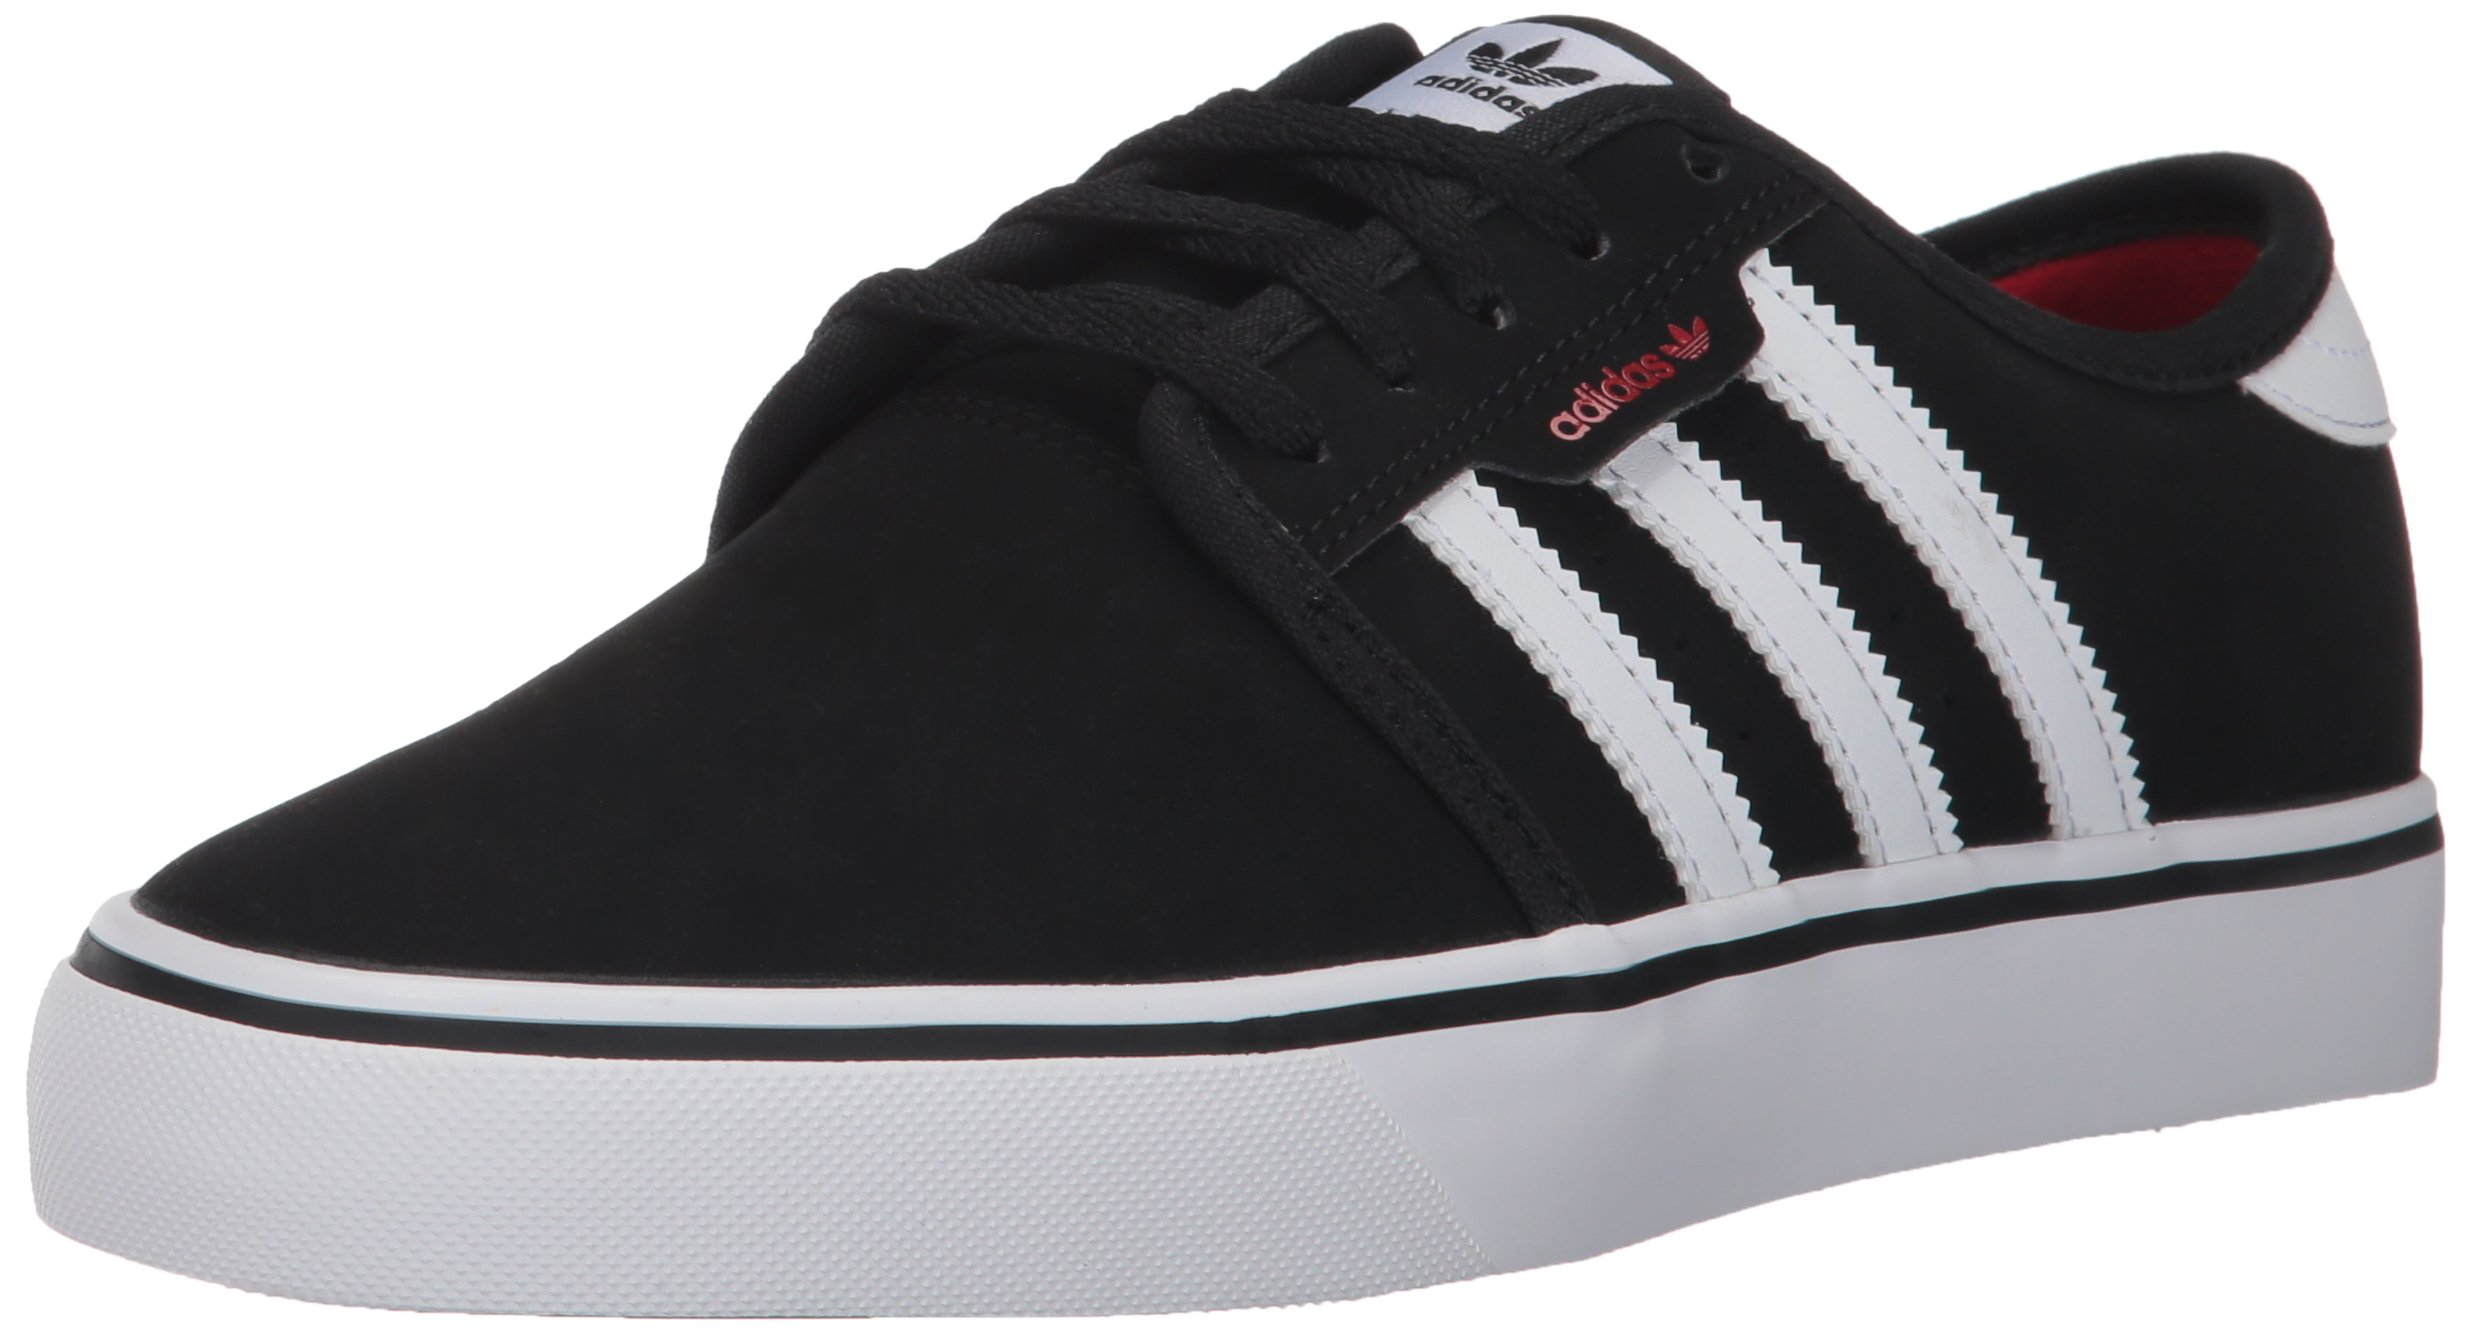 adidas Unisex Seeley J Skate Shoe, core Black, FTWR White, Scarlet, 11K M US Little Kid